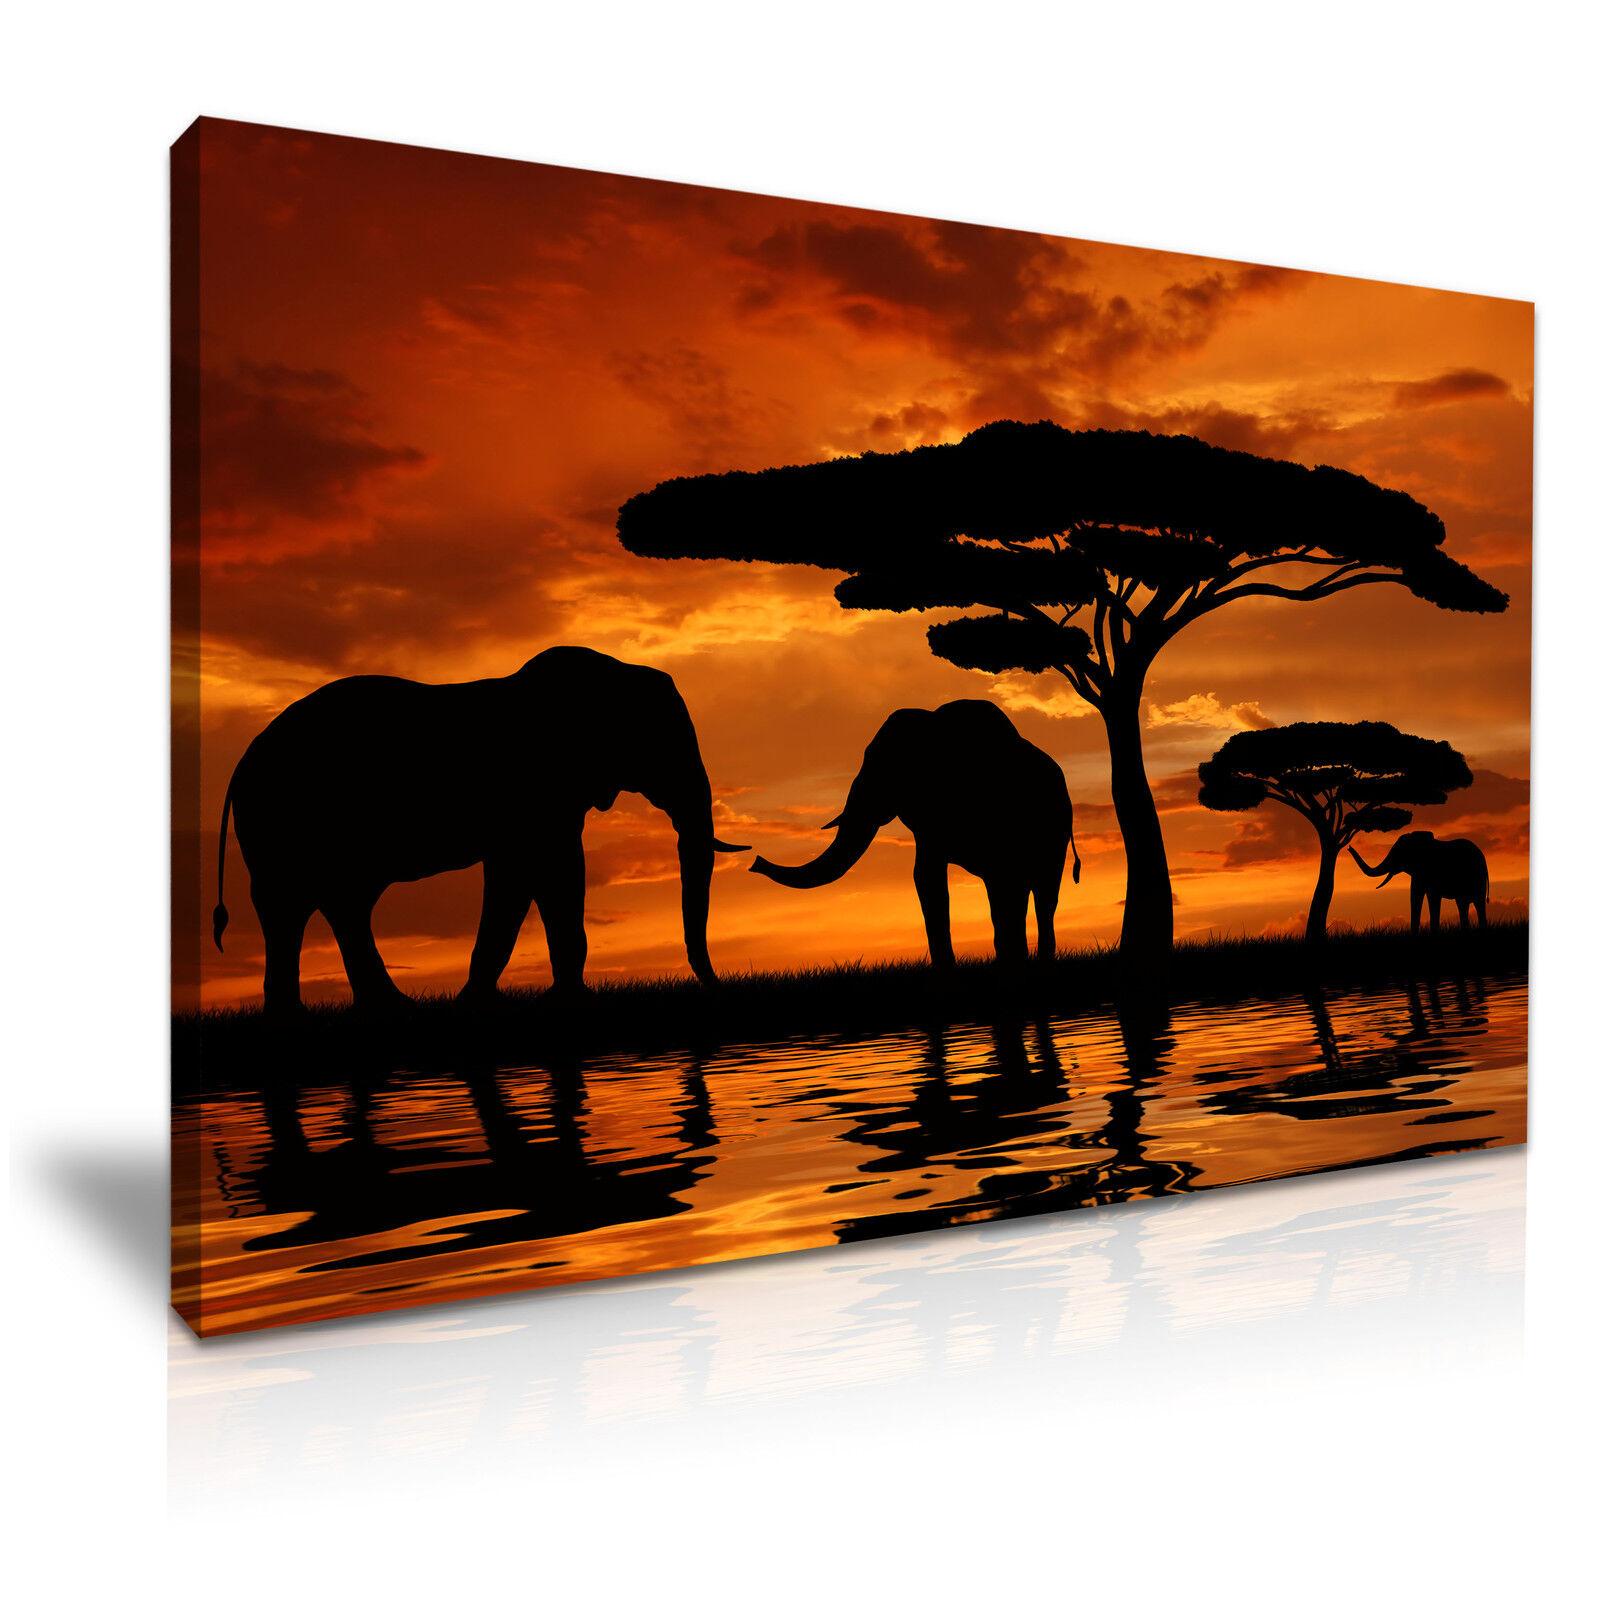 Animales Animales Animales Africanos elefantes Sunset LONA parojo arte Foto impresión 76x50cm c1a475